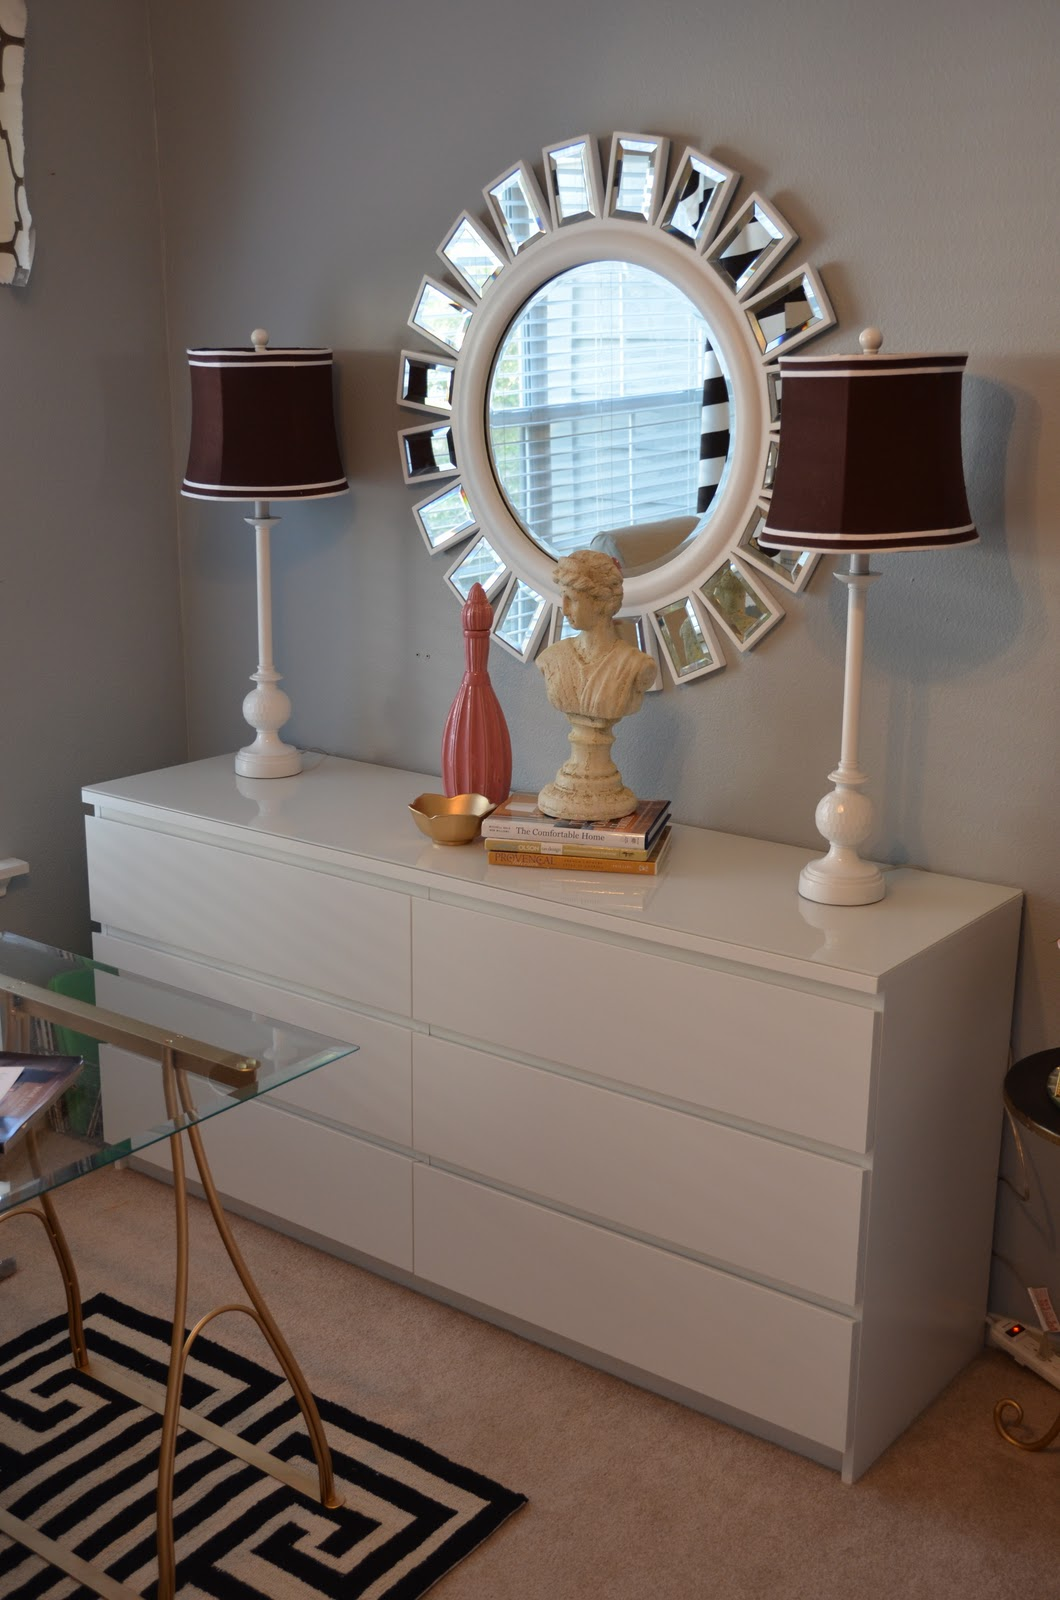 Ikea malm dresser goes glam amanda carol interiors - Appartement ikea ...